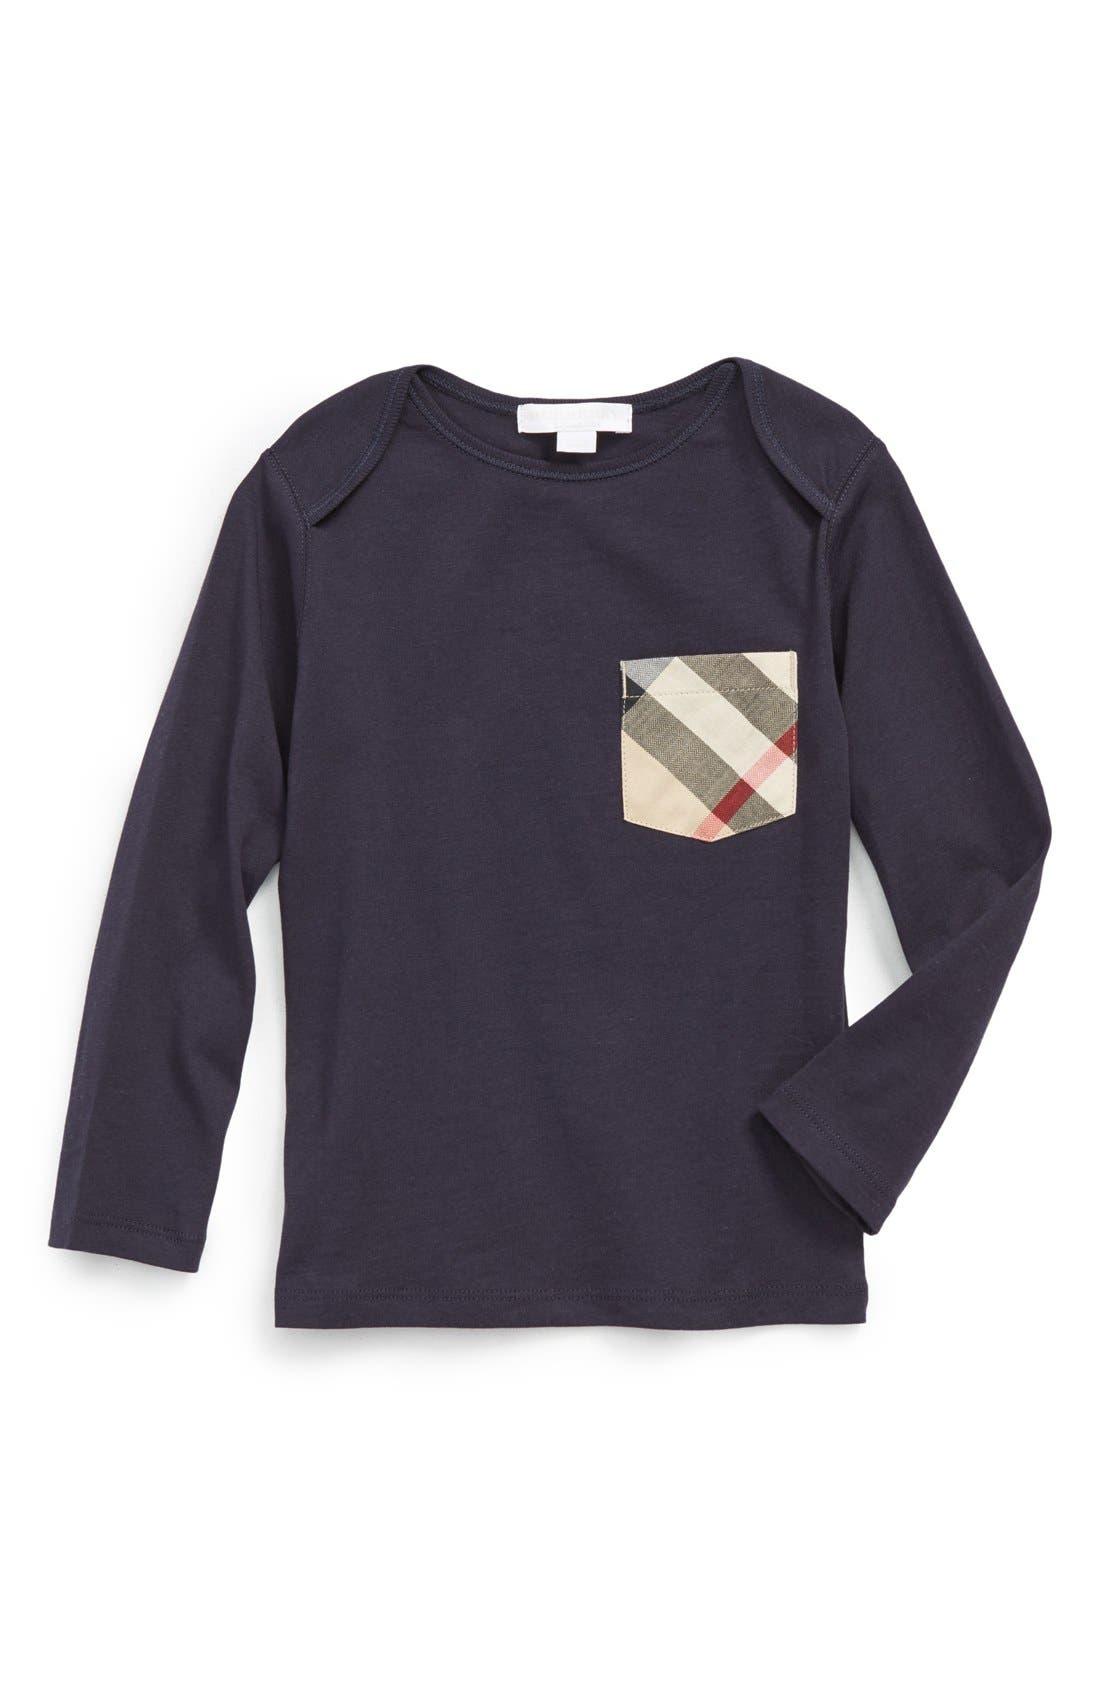 Main Image - Burberry 'Callum' Check Print Chest Pocket T-Shirt (Baby Boys)